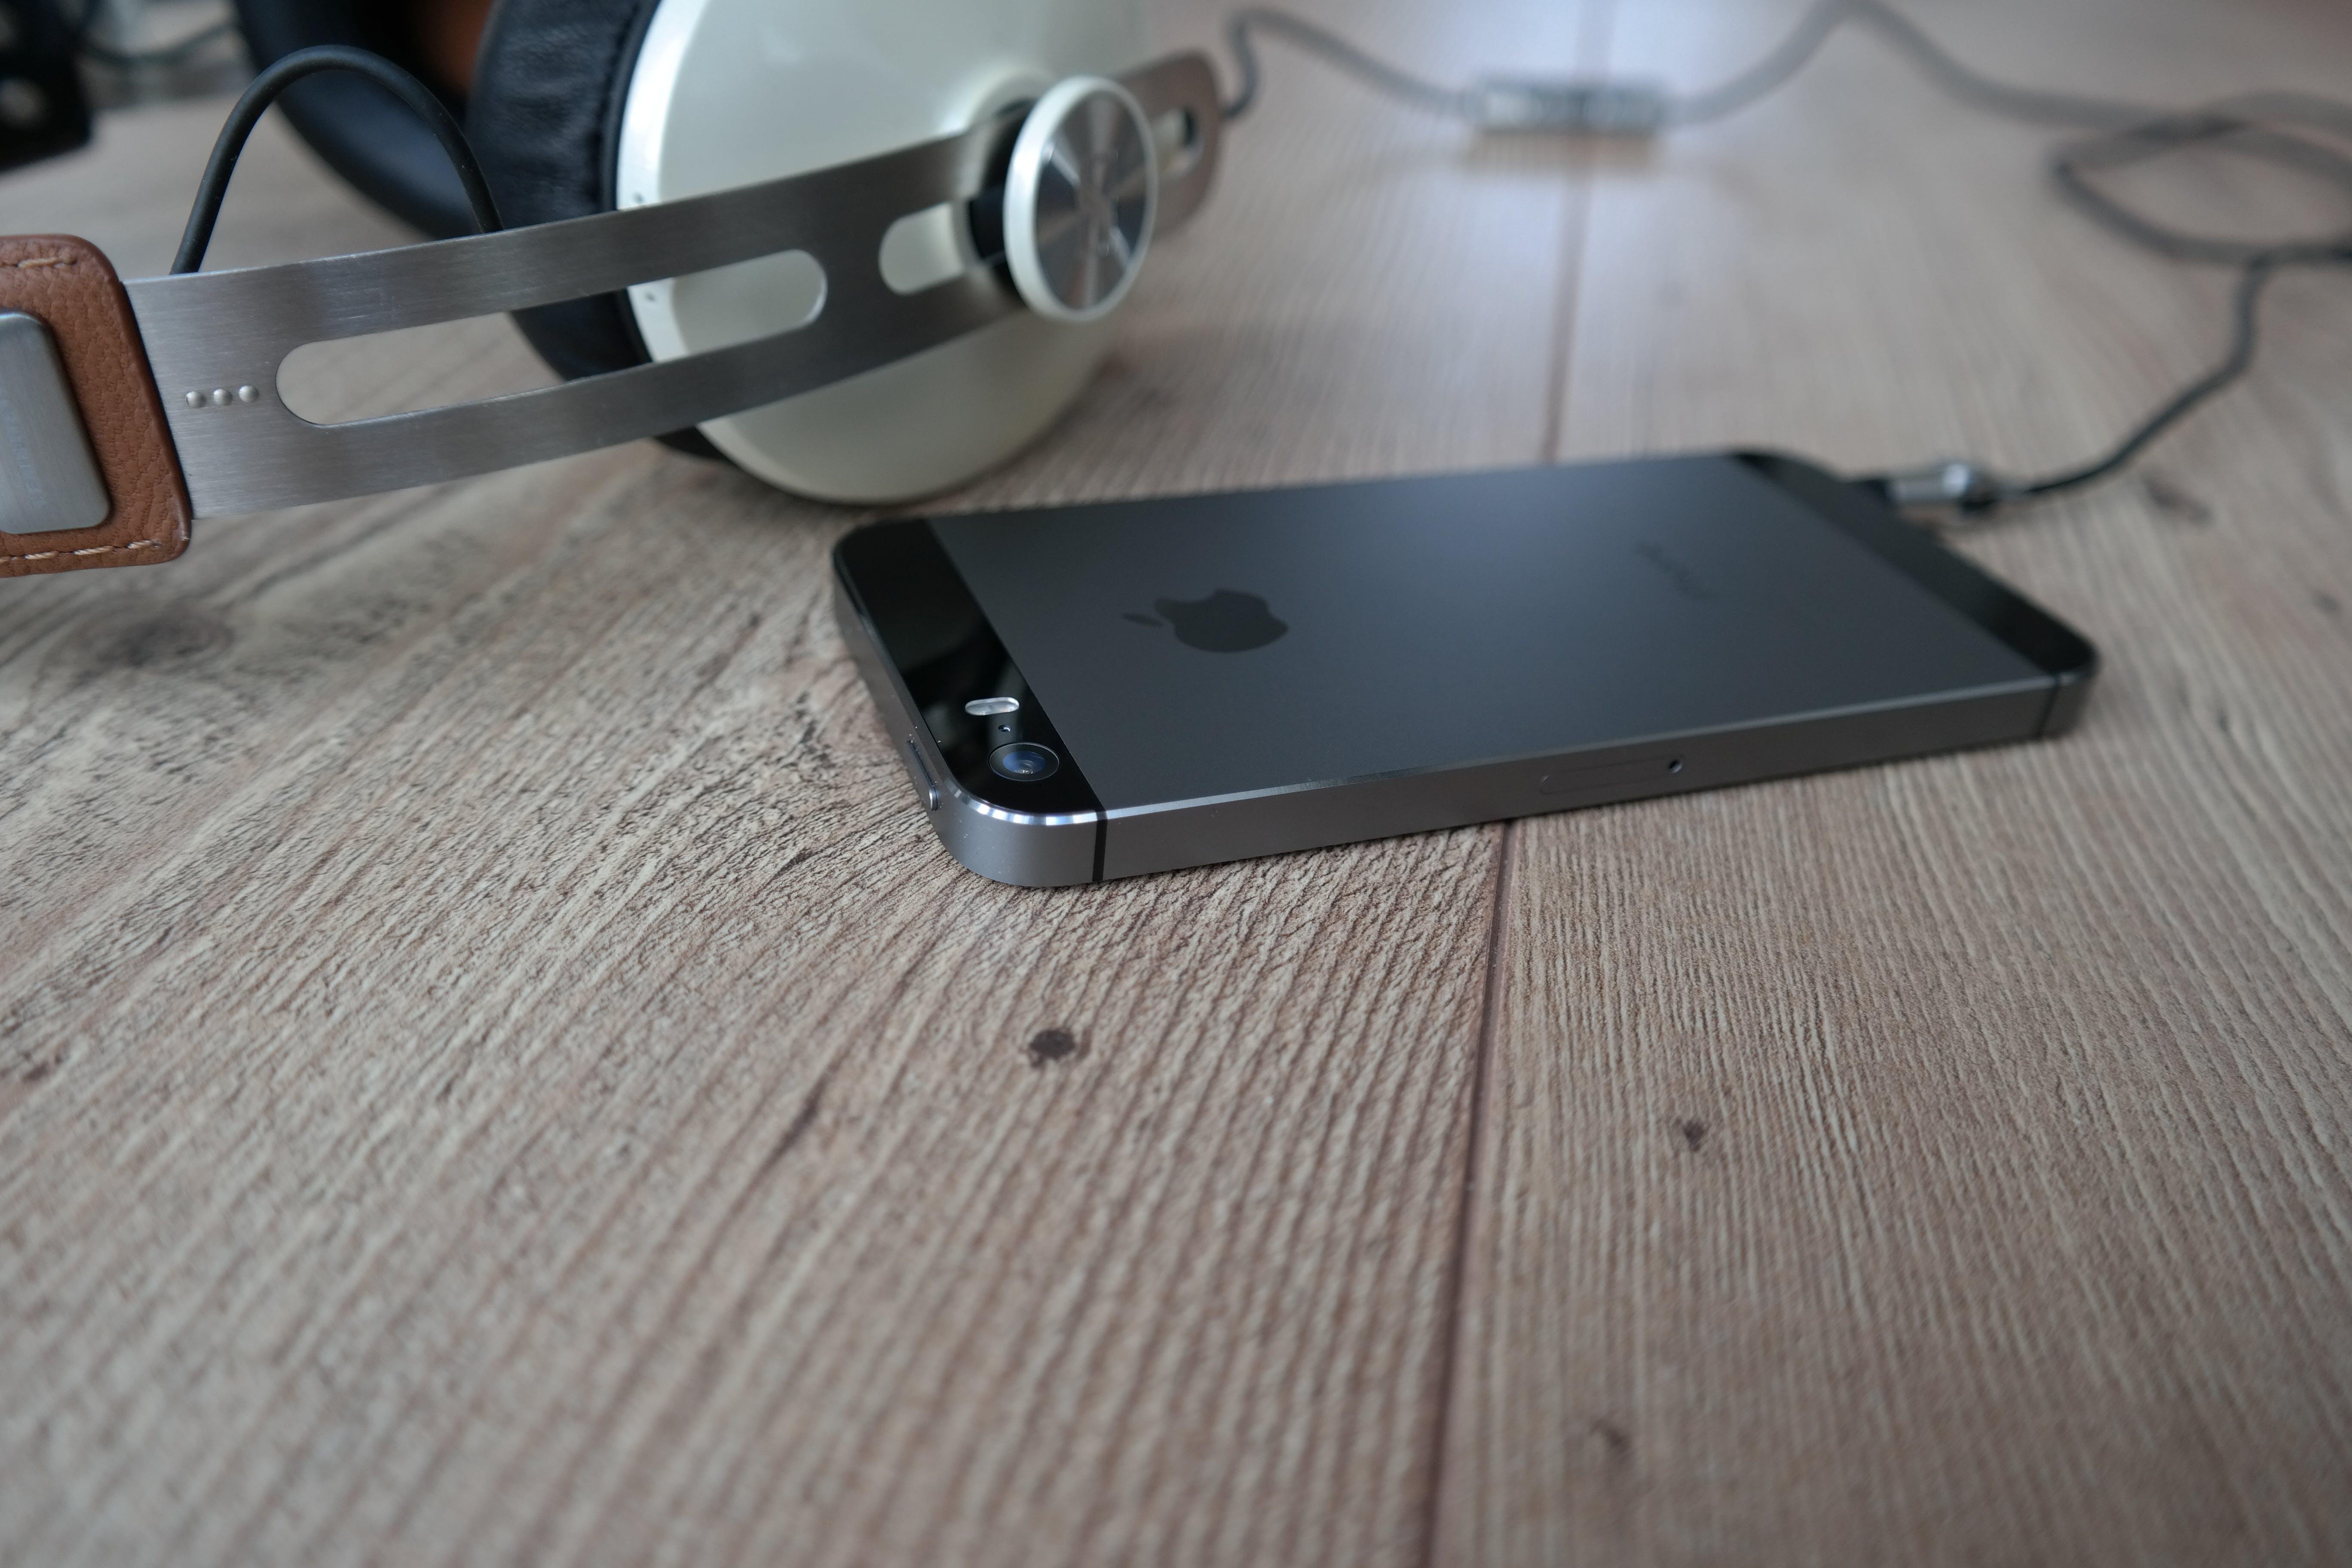 of headphone, iphone, iphone 5s, smartphone